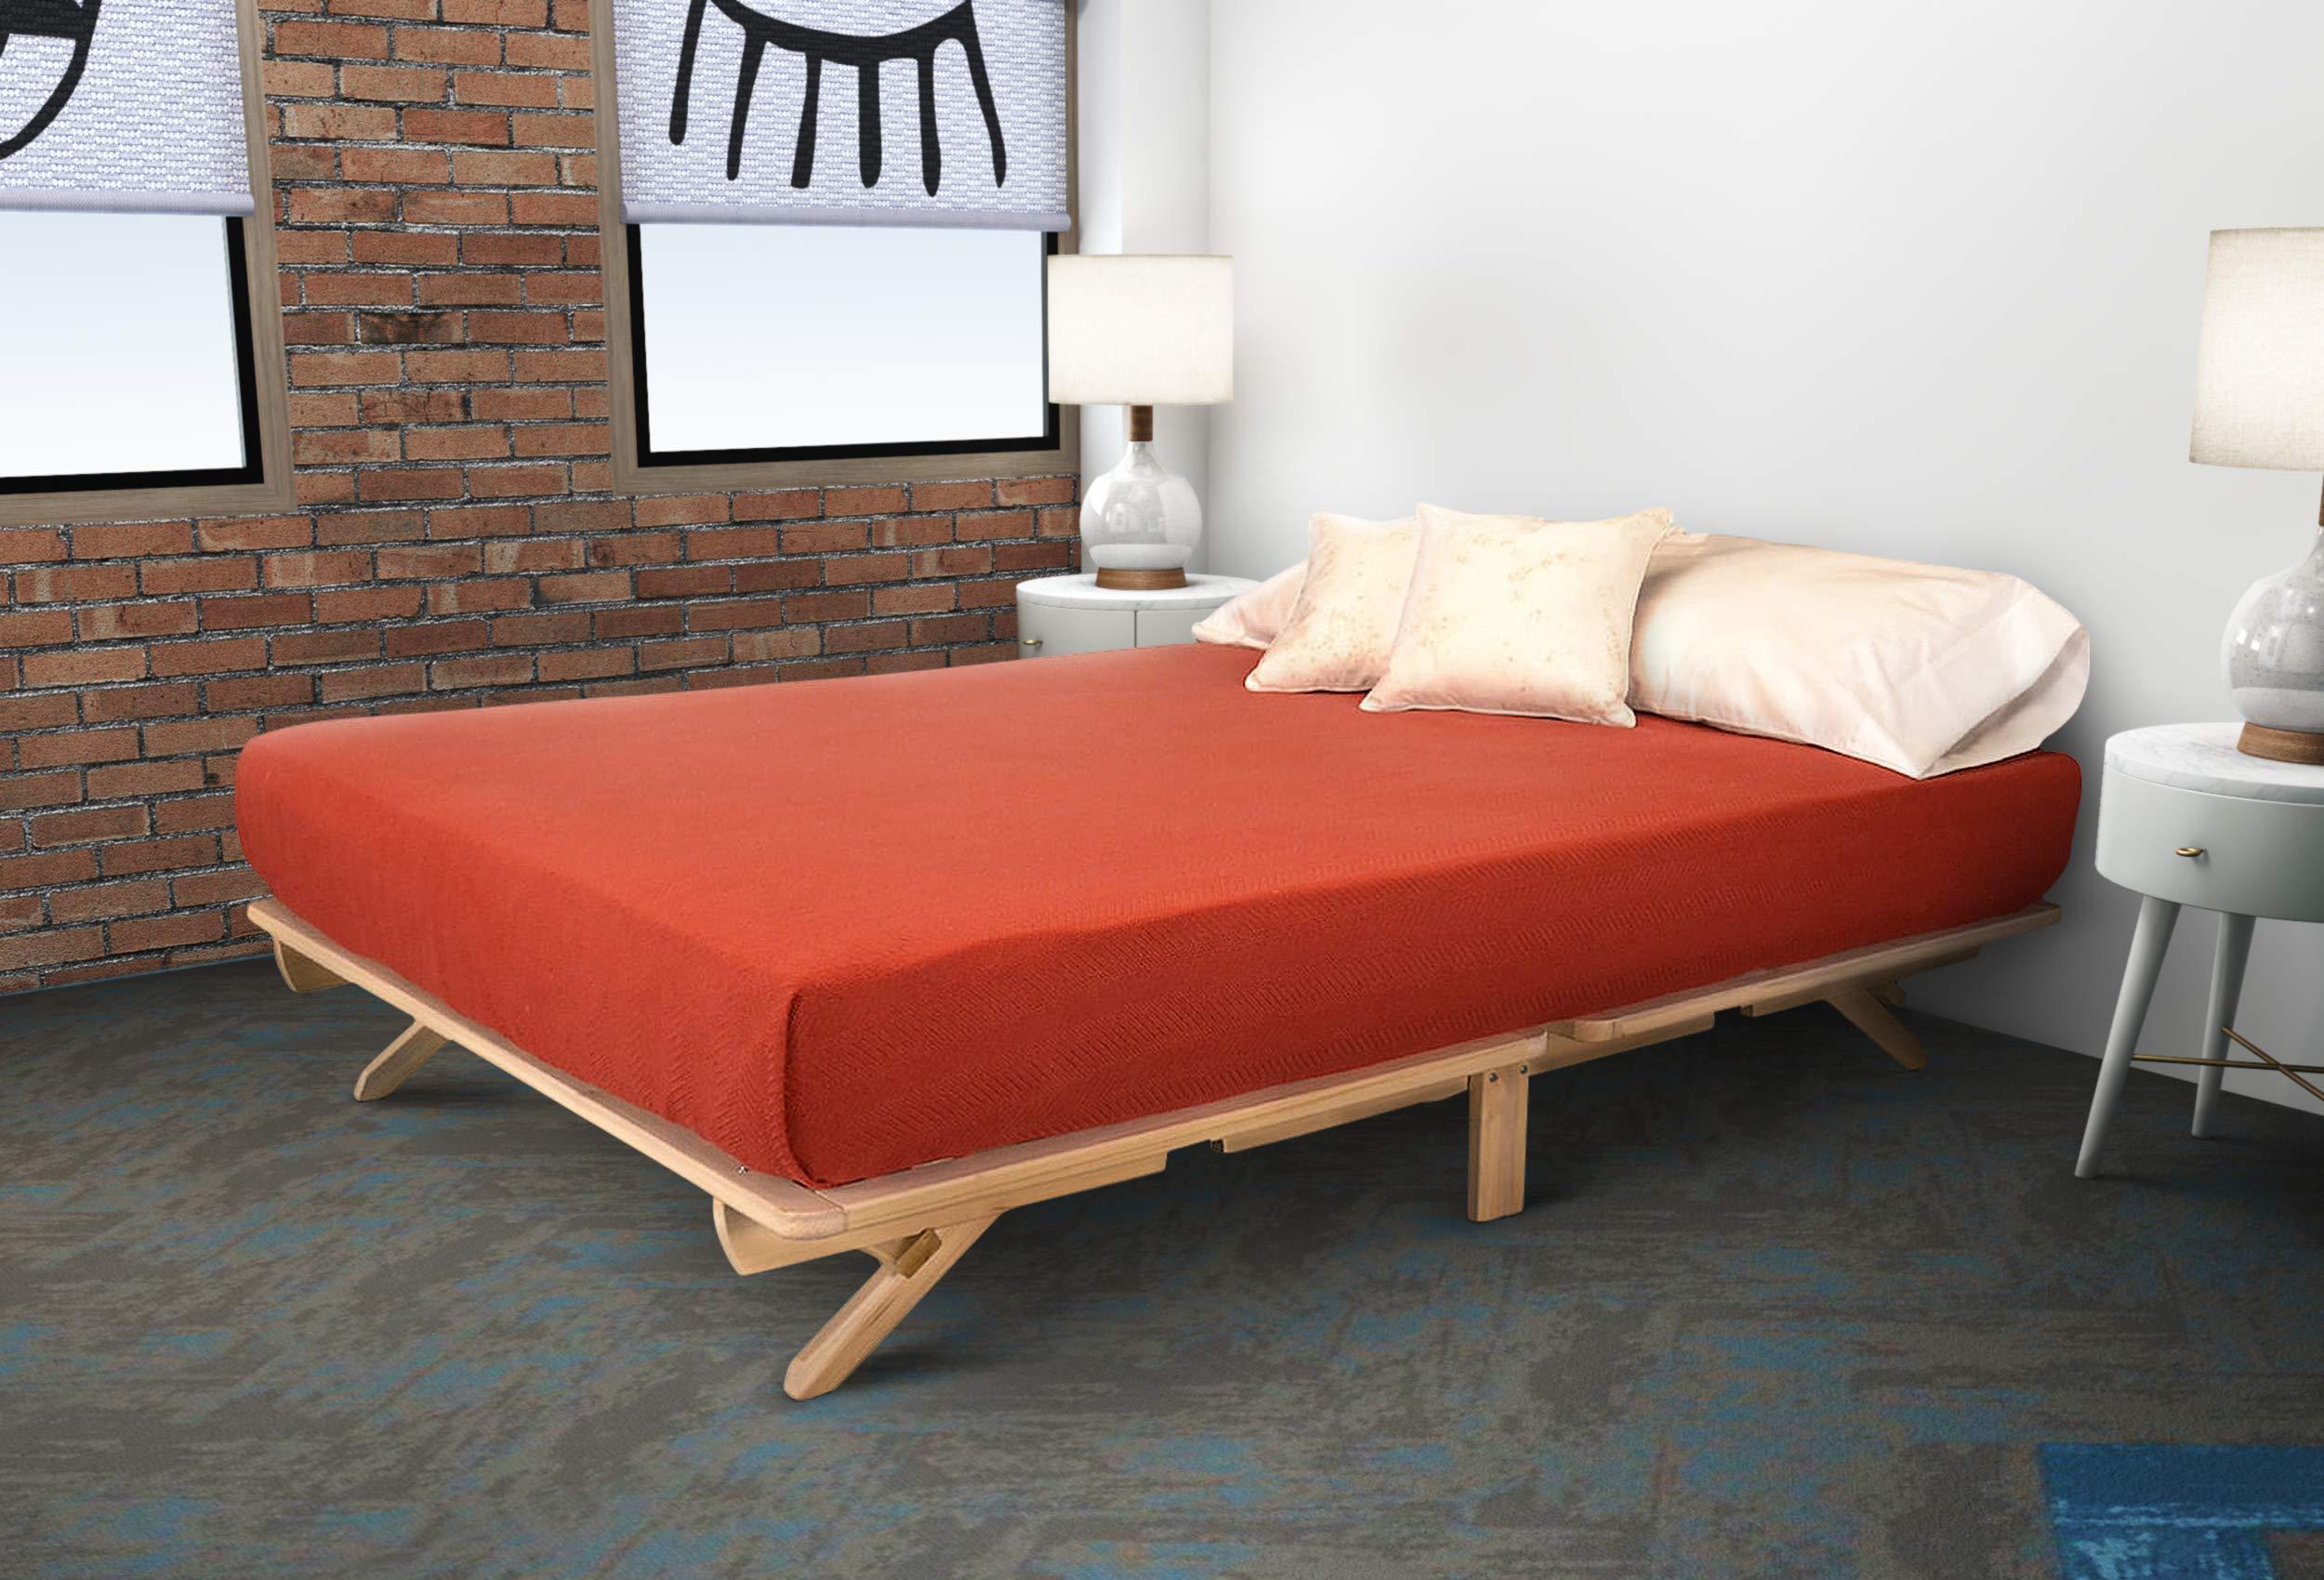 Fold Platform Bed - Queen by KD Frames